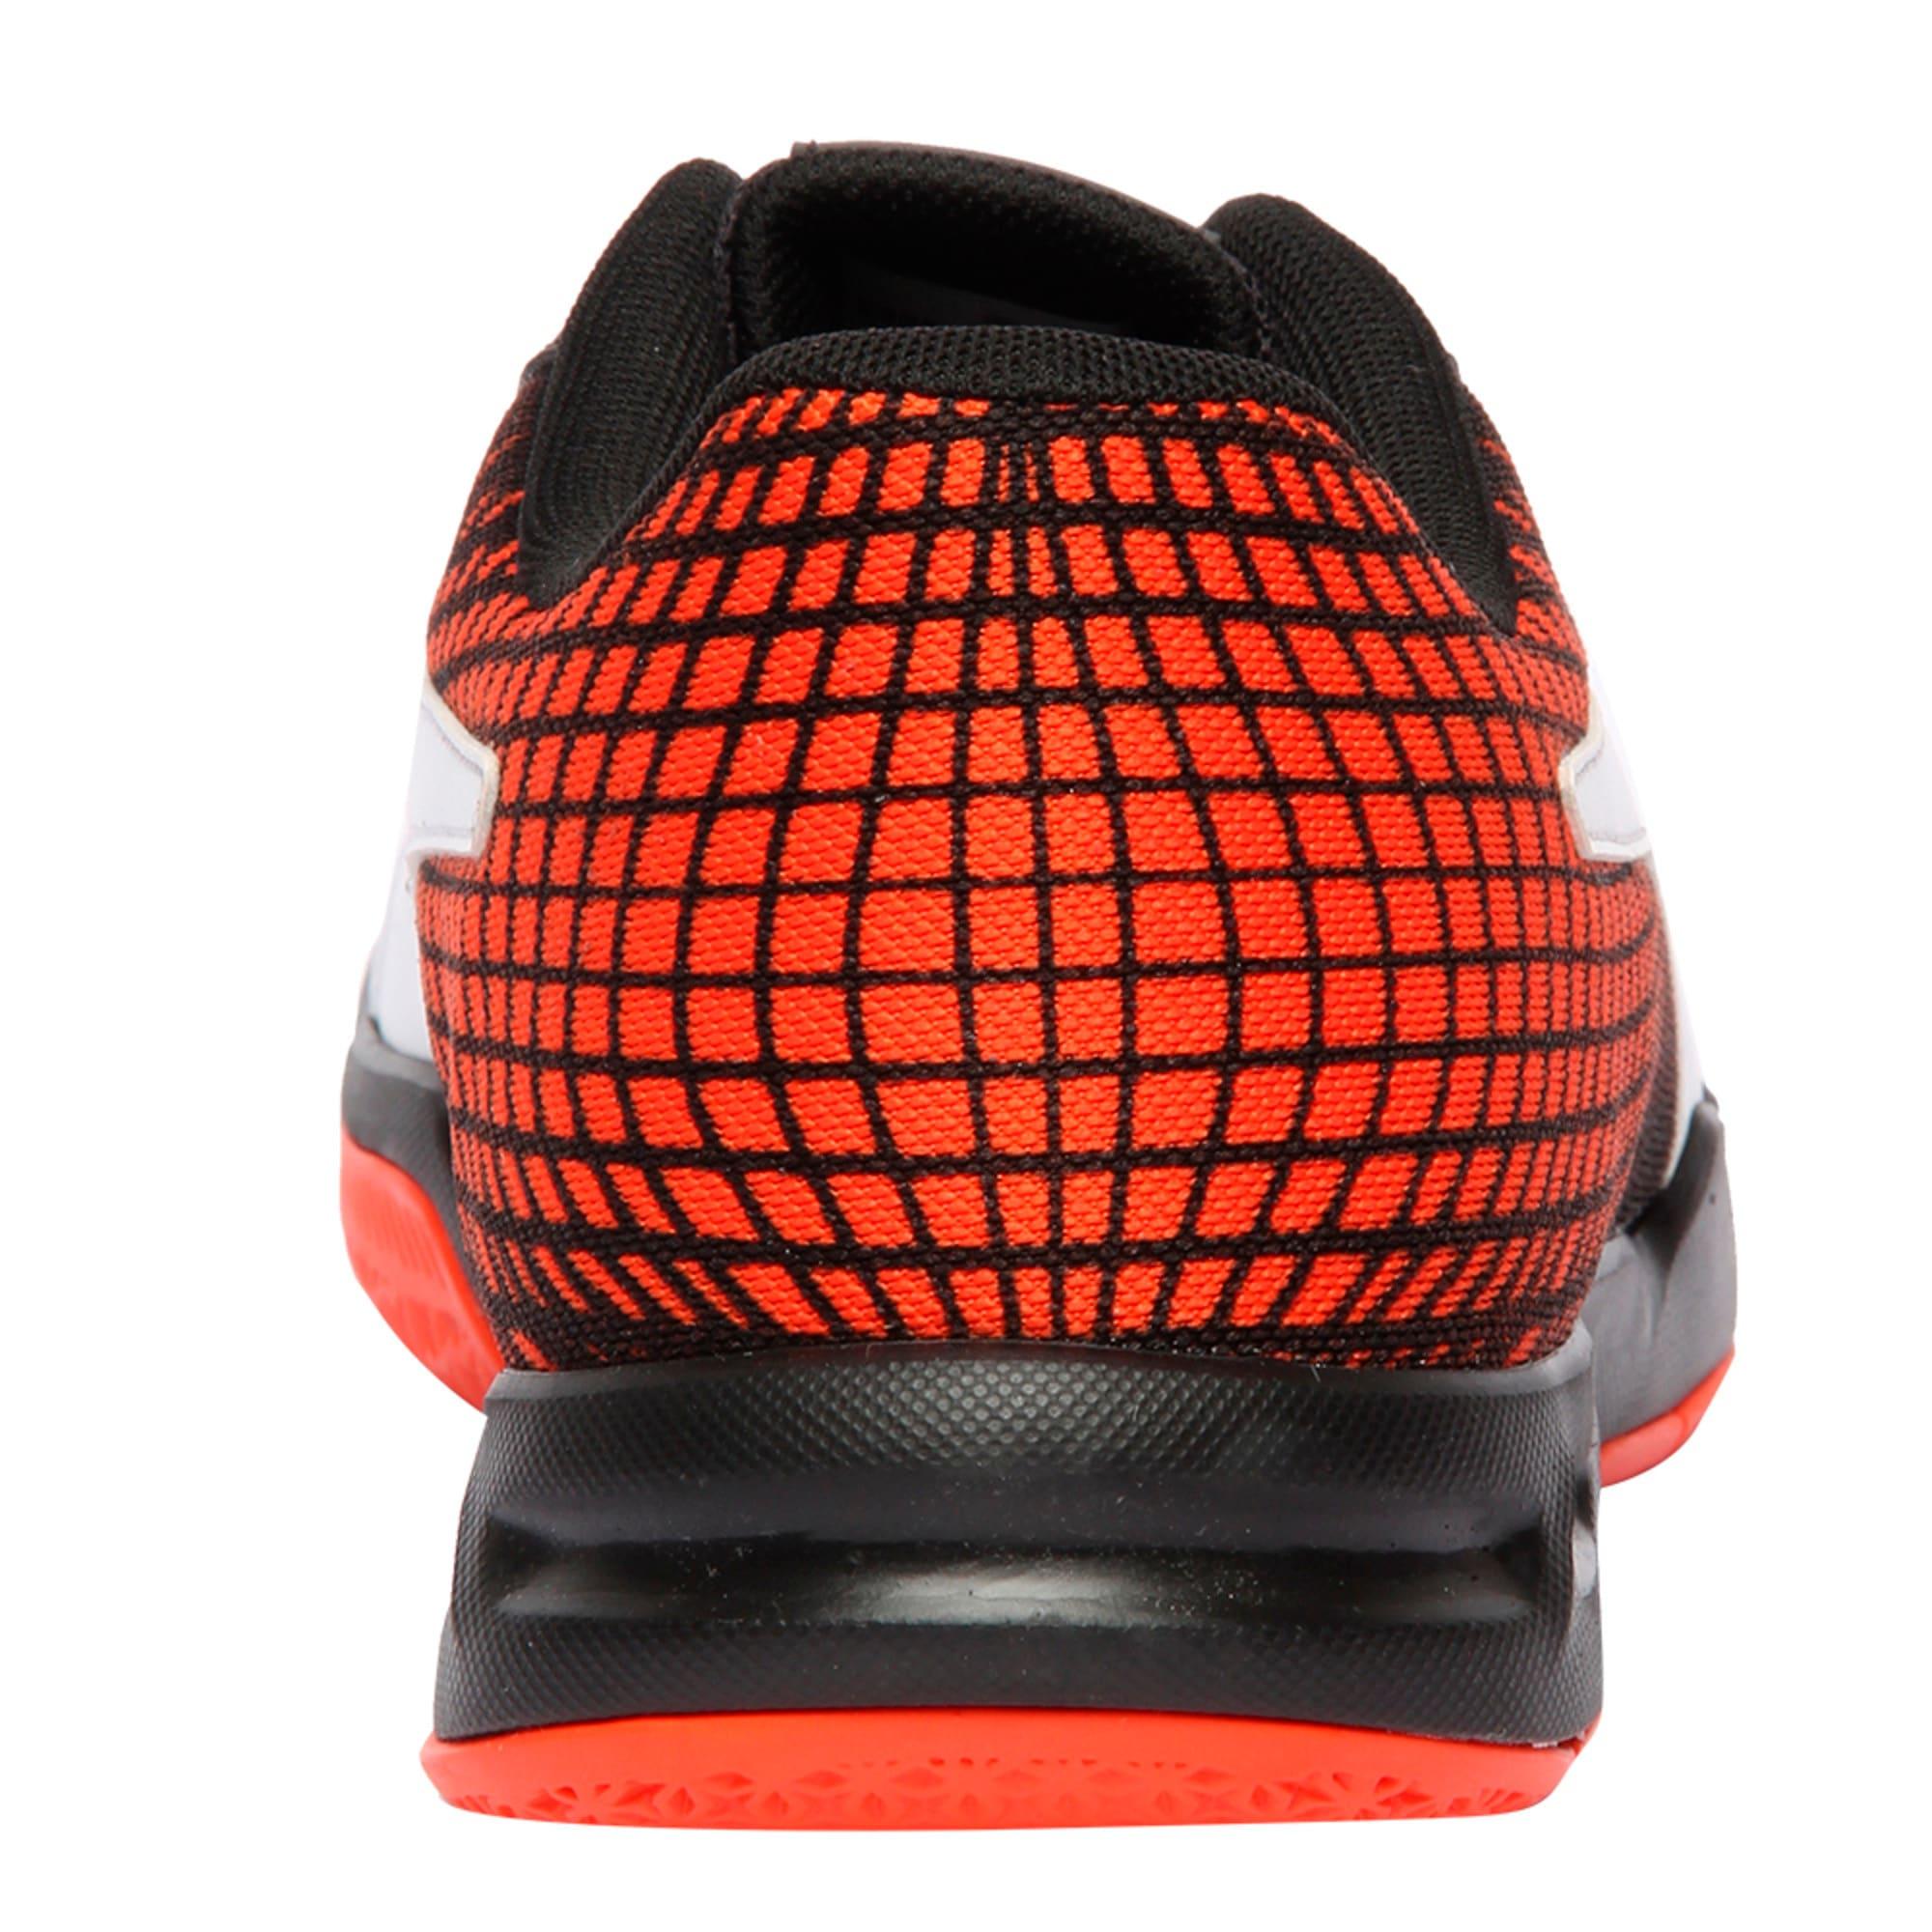 Thumbnail 4 of Veloz Indoor NG Training Shoes, Black-White-Cherry, medium-IND